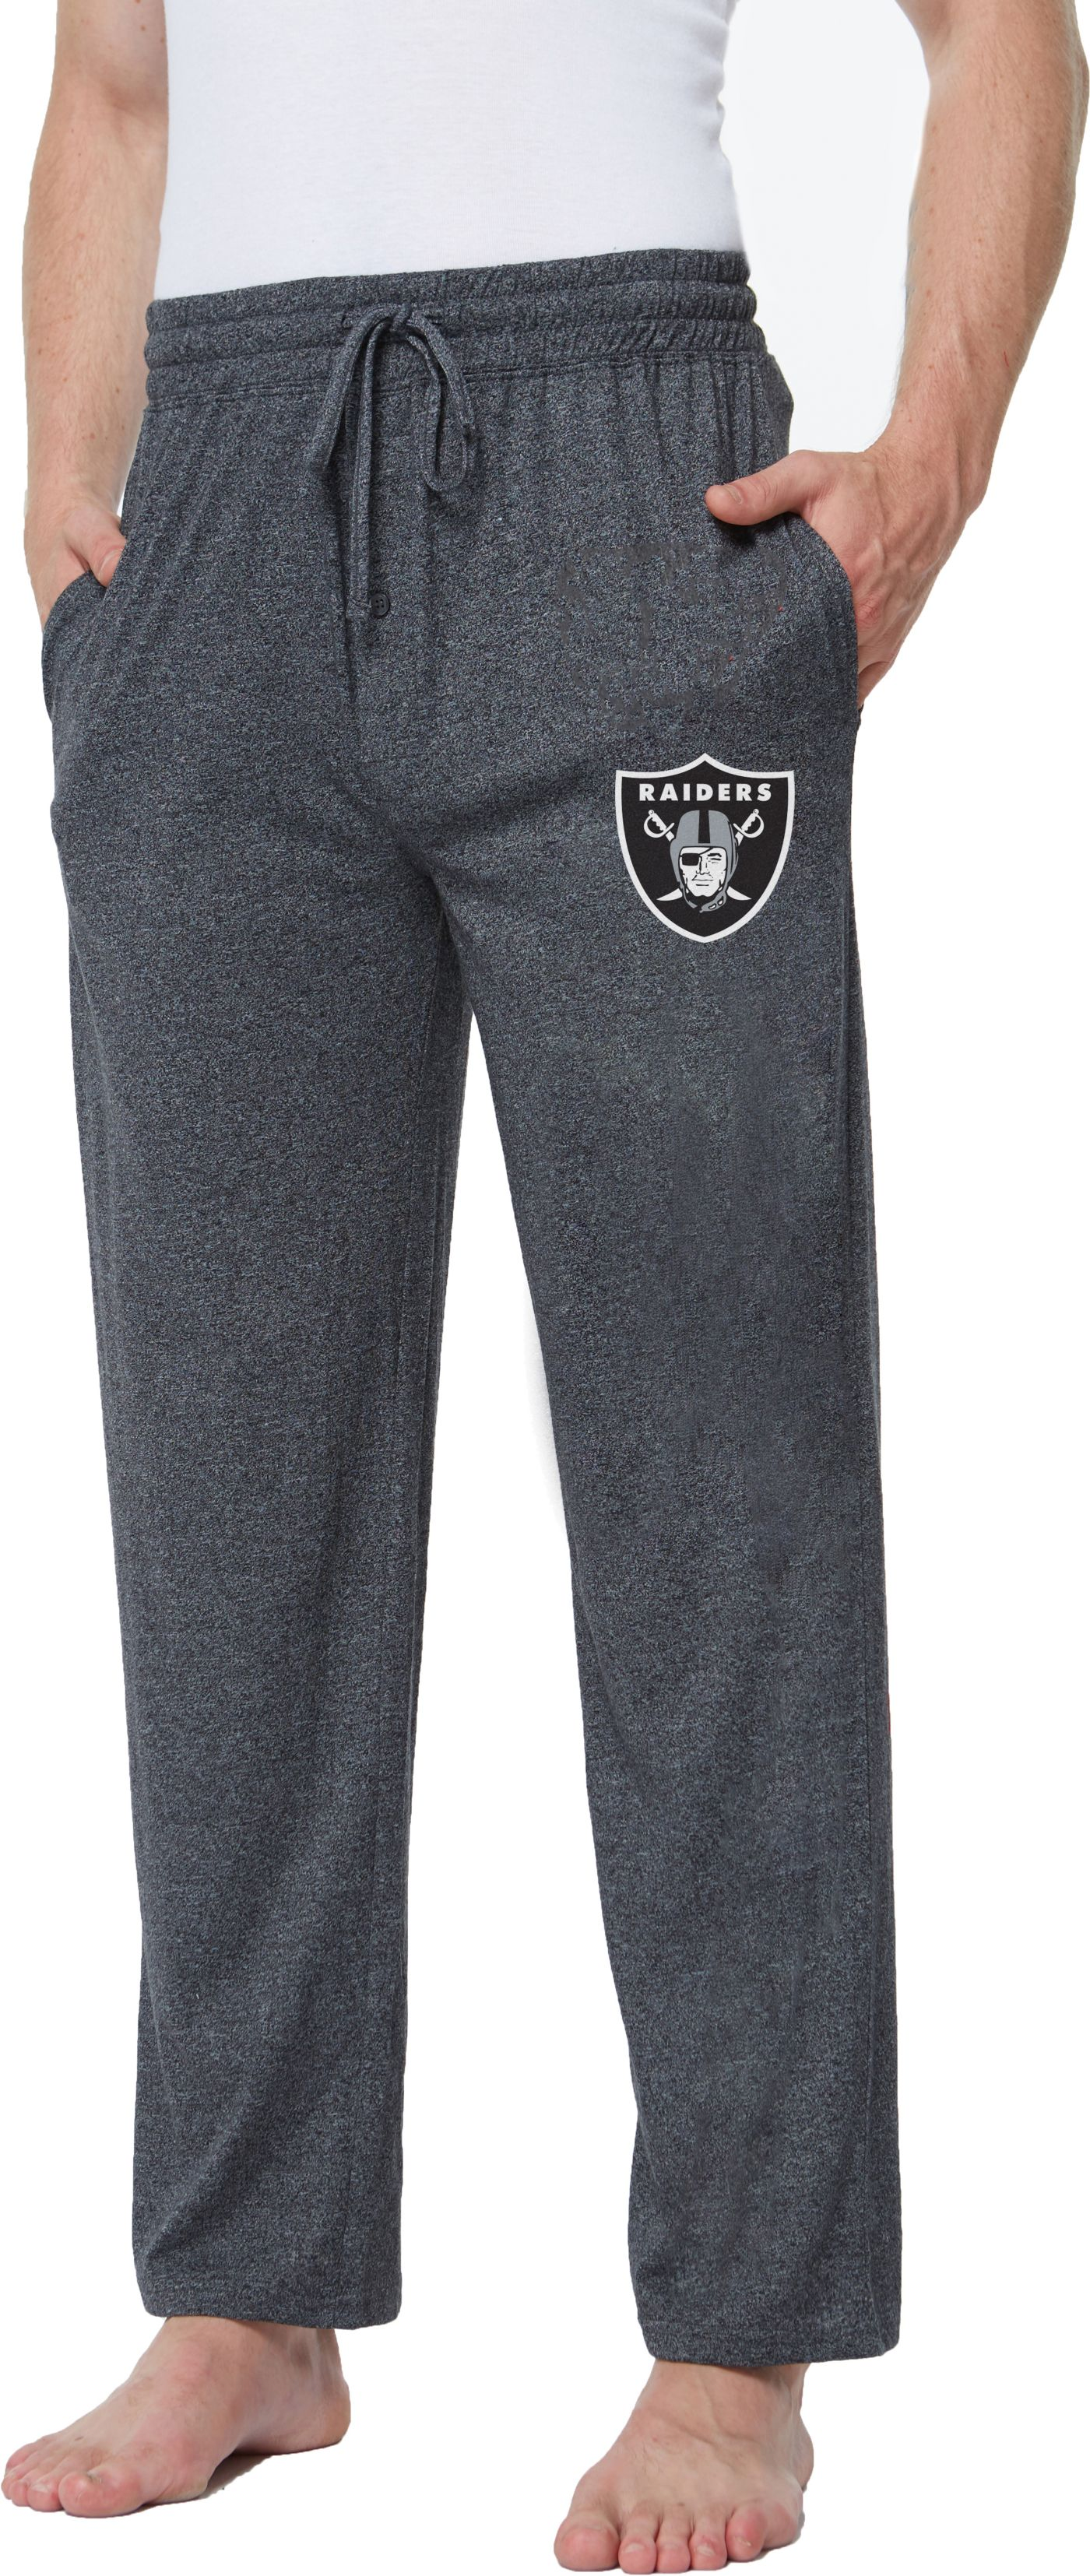 Concepts Sport Men's Oakland Raiders Quest Charcoal Jersey Pants